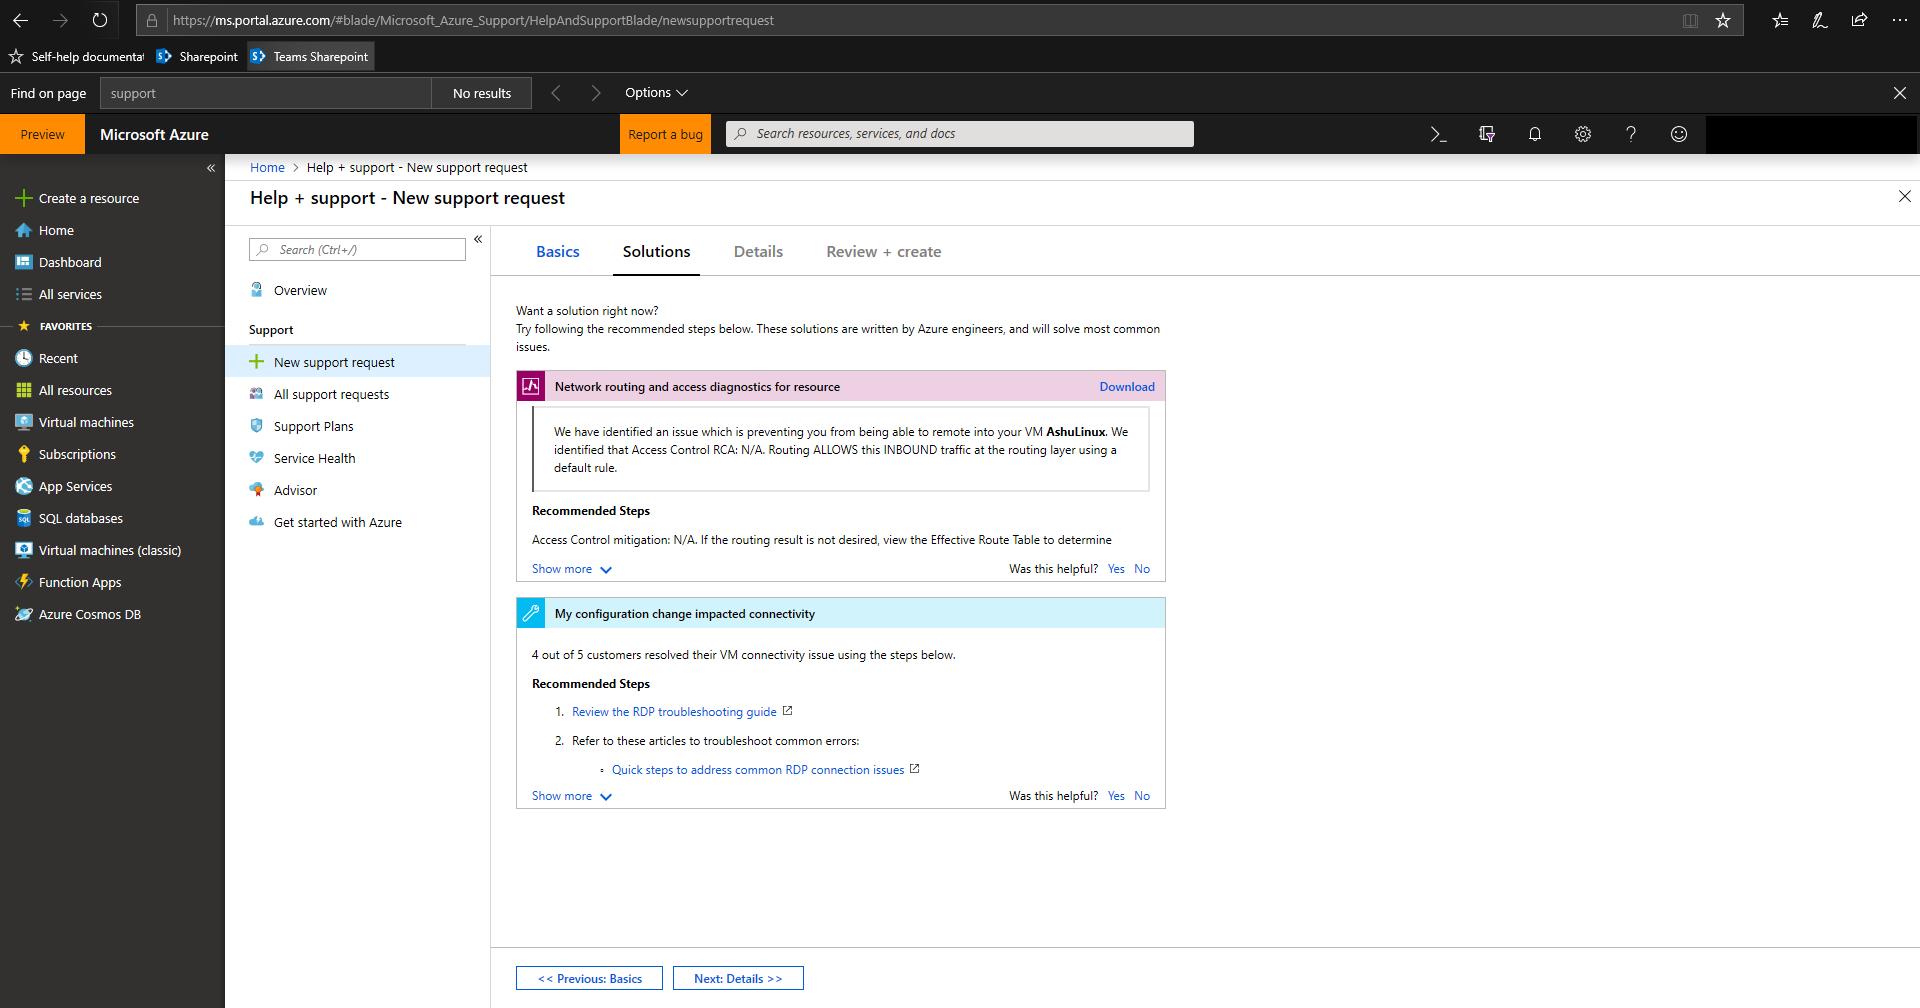 Solutions screenshot